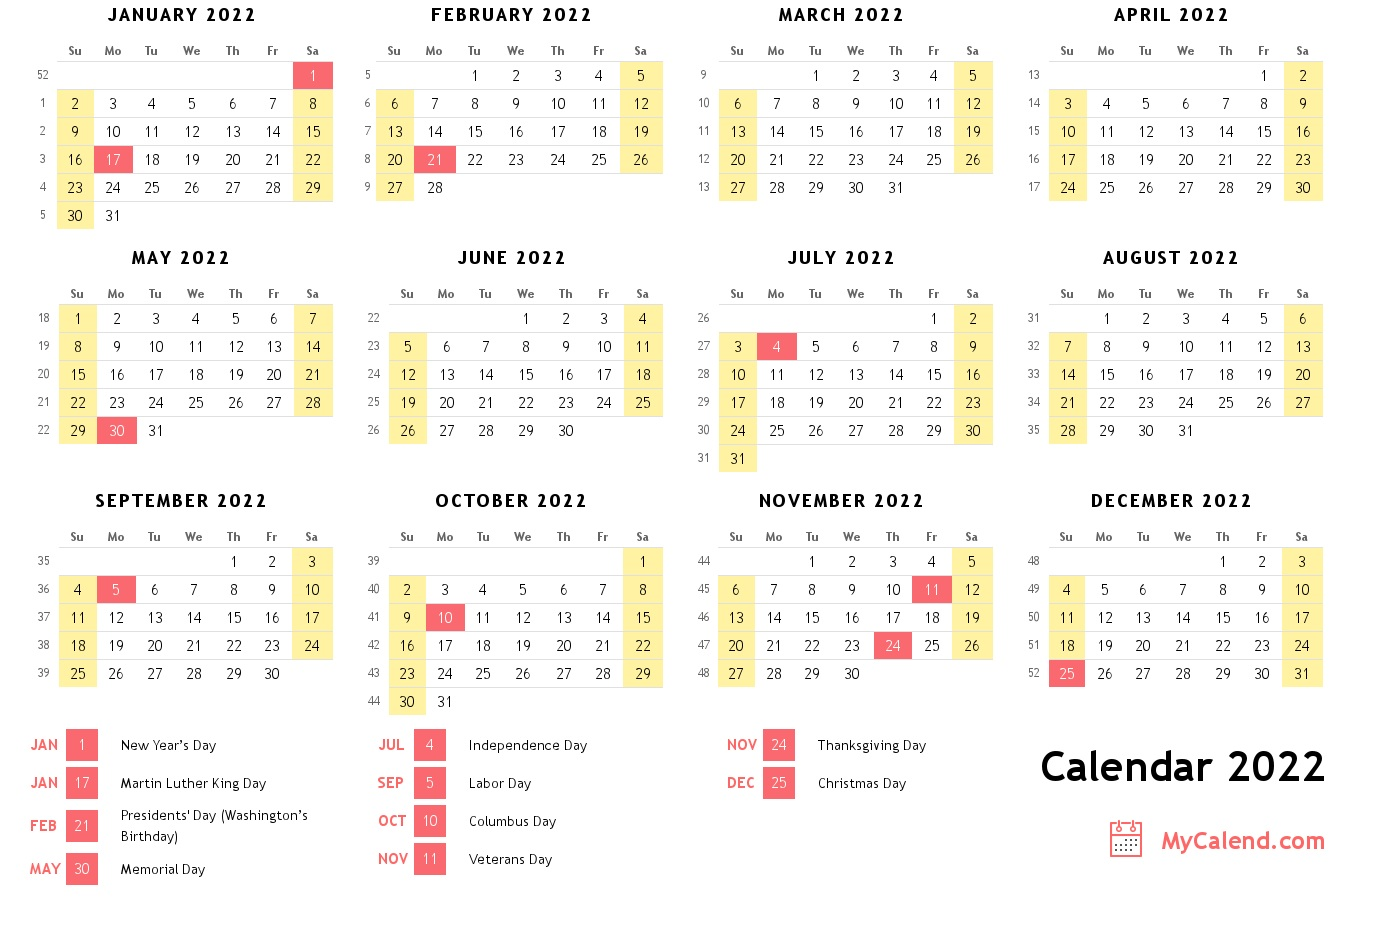 2022 Calendar with holidays - free printable calendar